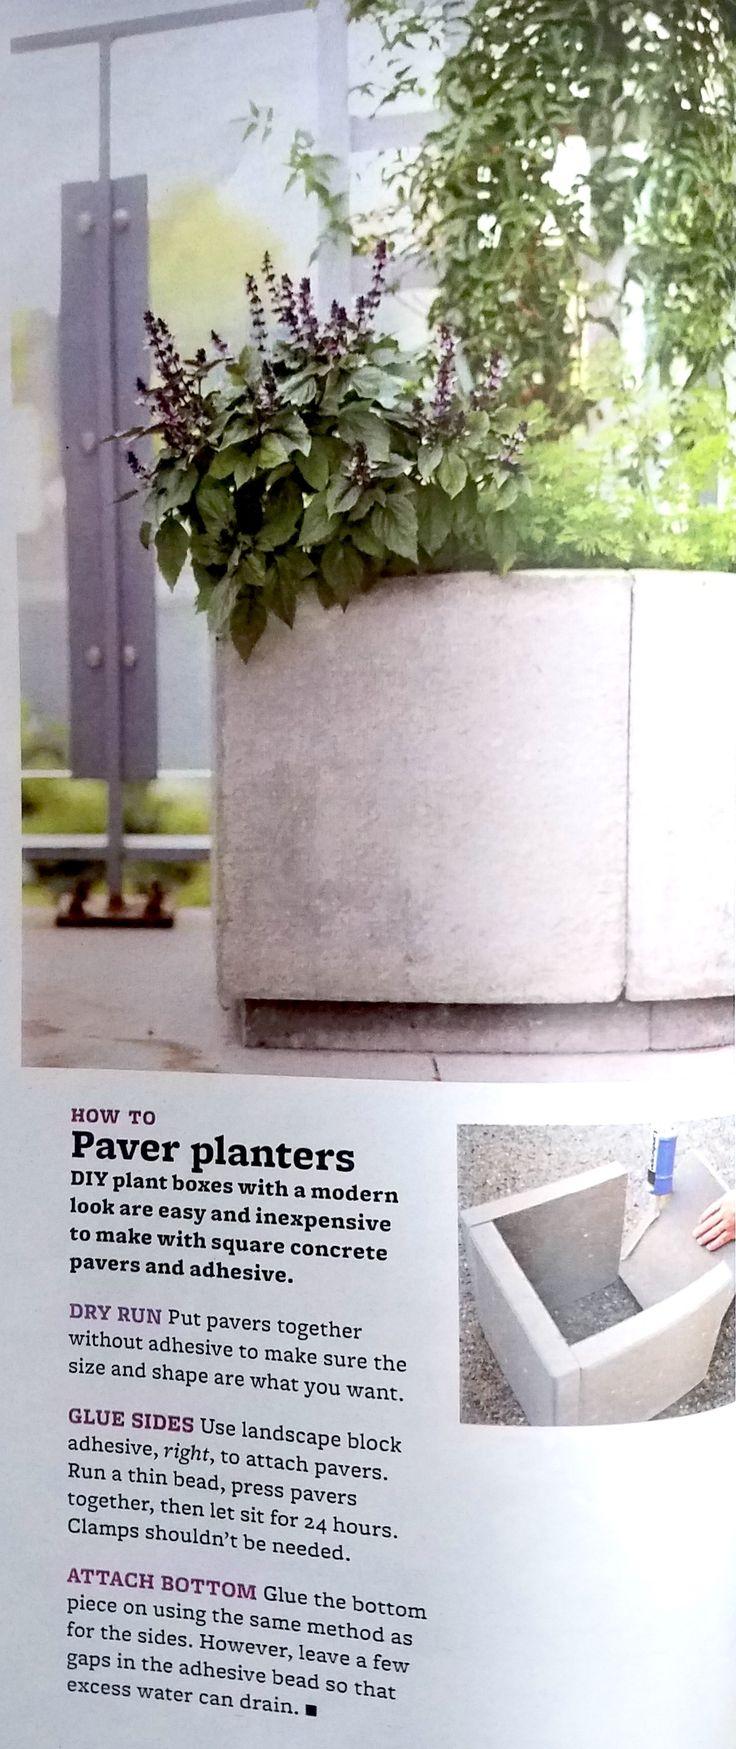 Best 25 concrete glue ideas on pinterest geometric candle genius garden hack use concrete glue to affix garden pavers together for concrete planters in baanklon Images